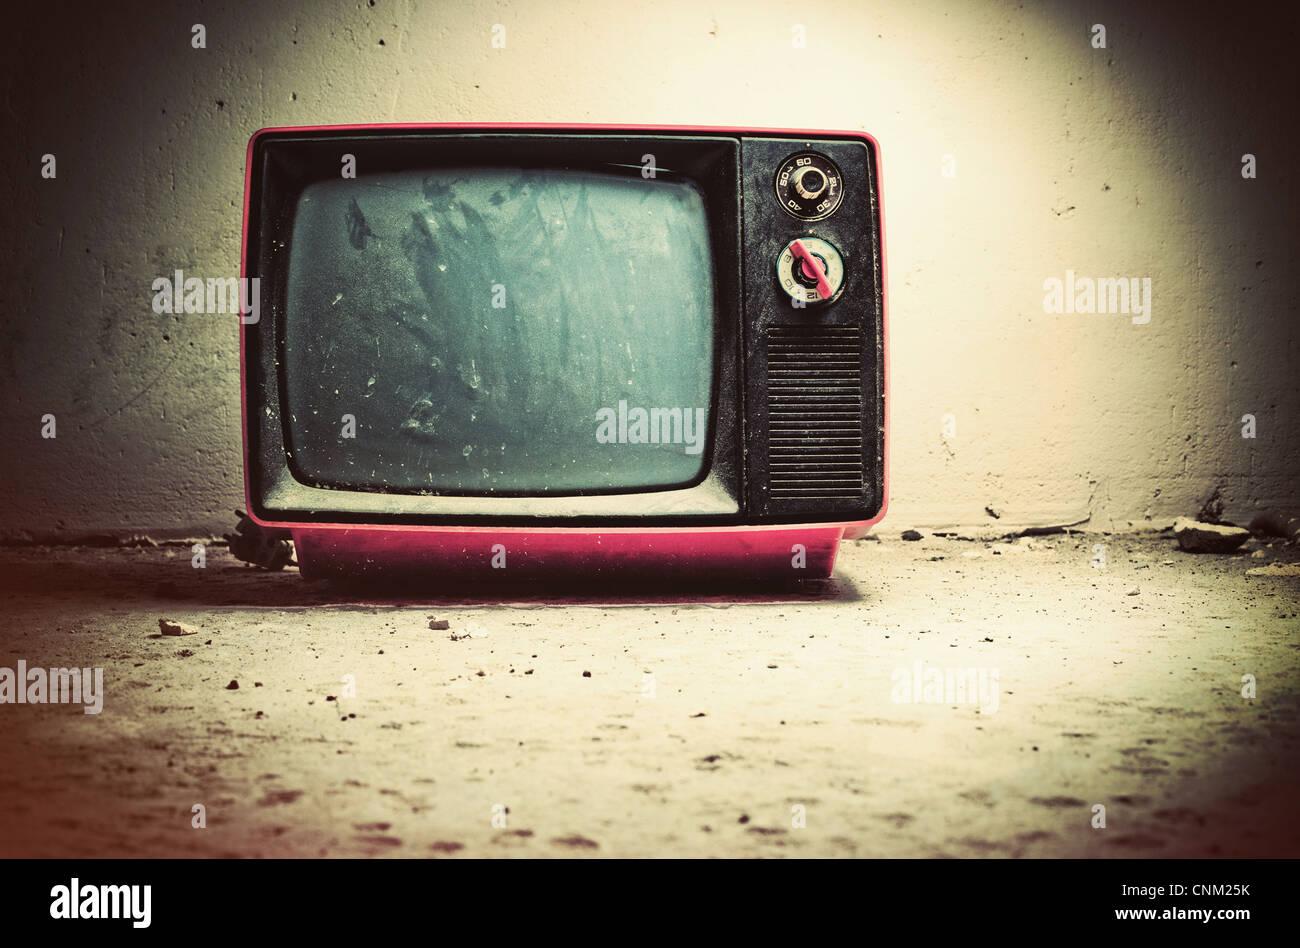 Alte TV im Zimmer. Retro-Stil Farben. Stockfoto